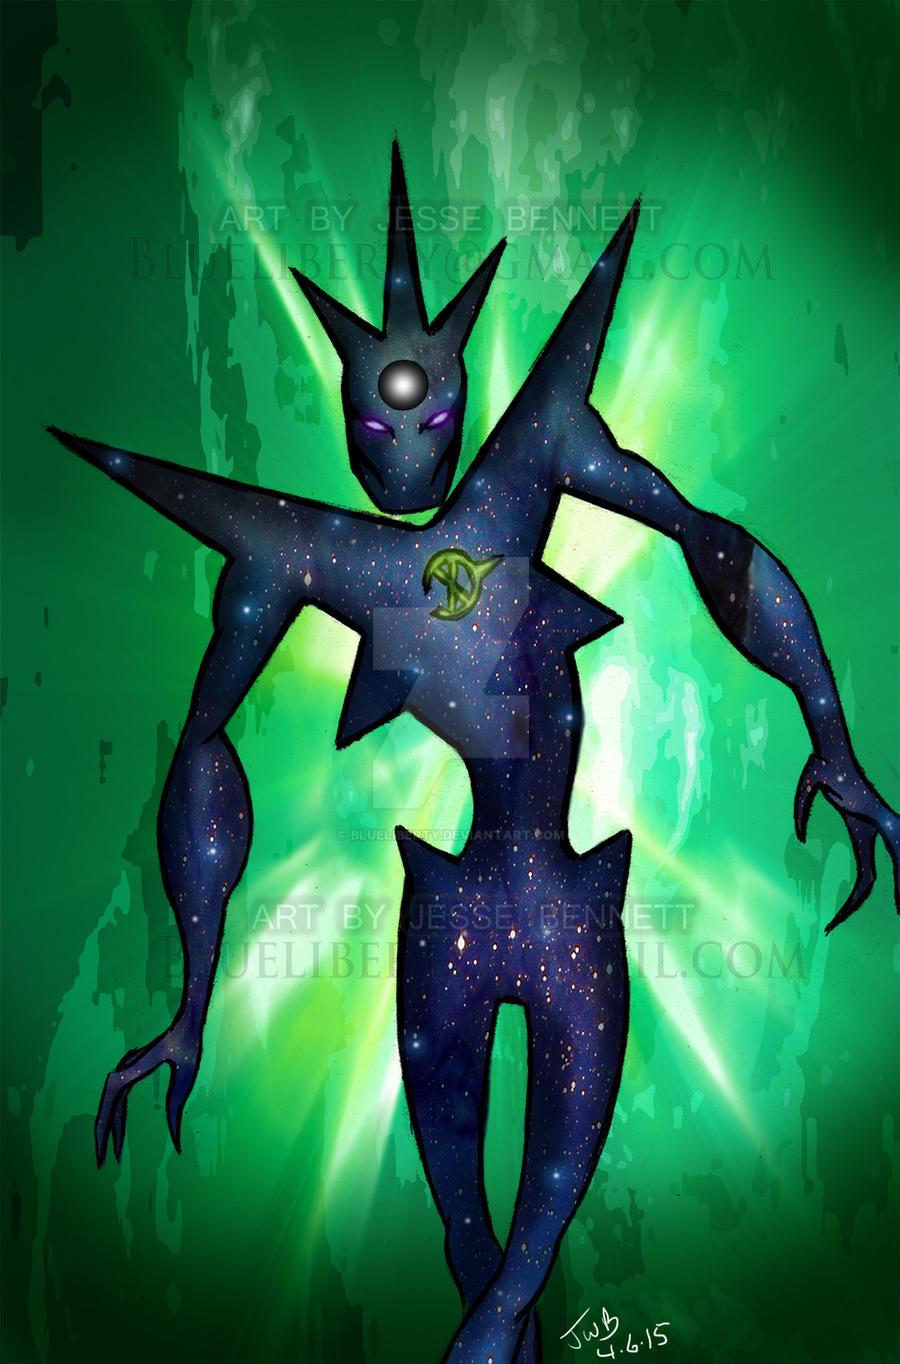 Alien x ben 10 by blueliberty on deviantart - Ben ten alien x ...